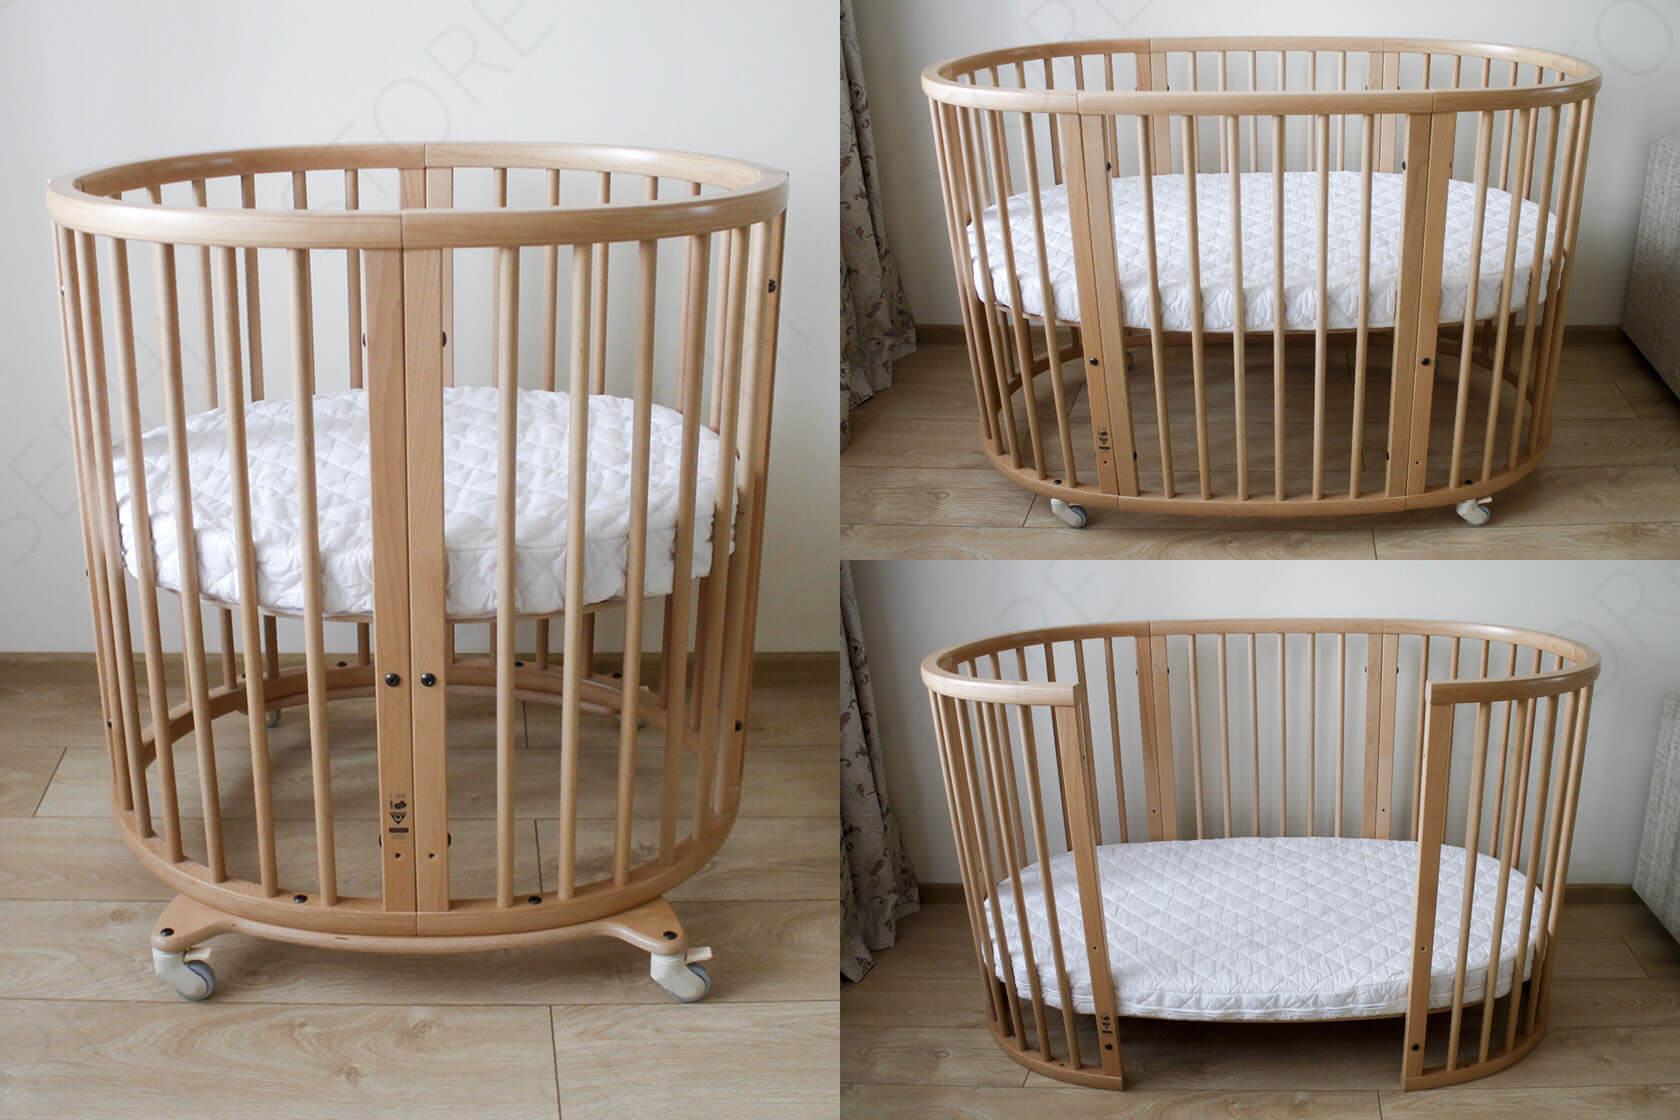 Matras Stokke Sleepi : Stokke sleepi купить кроватку цены отзывы характеристики